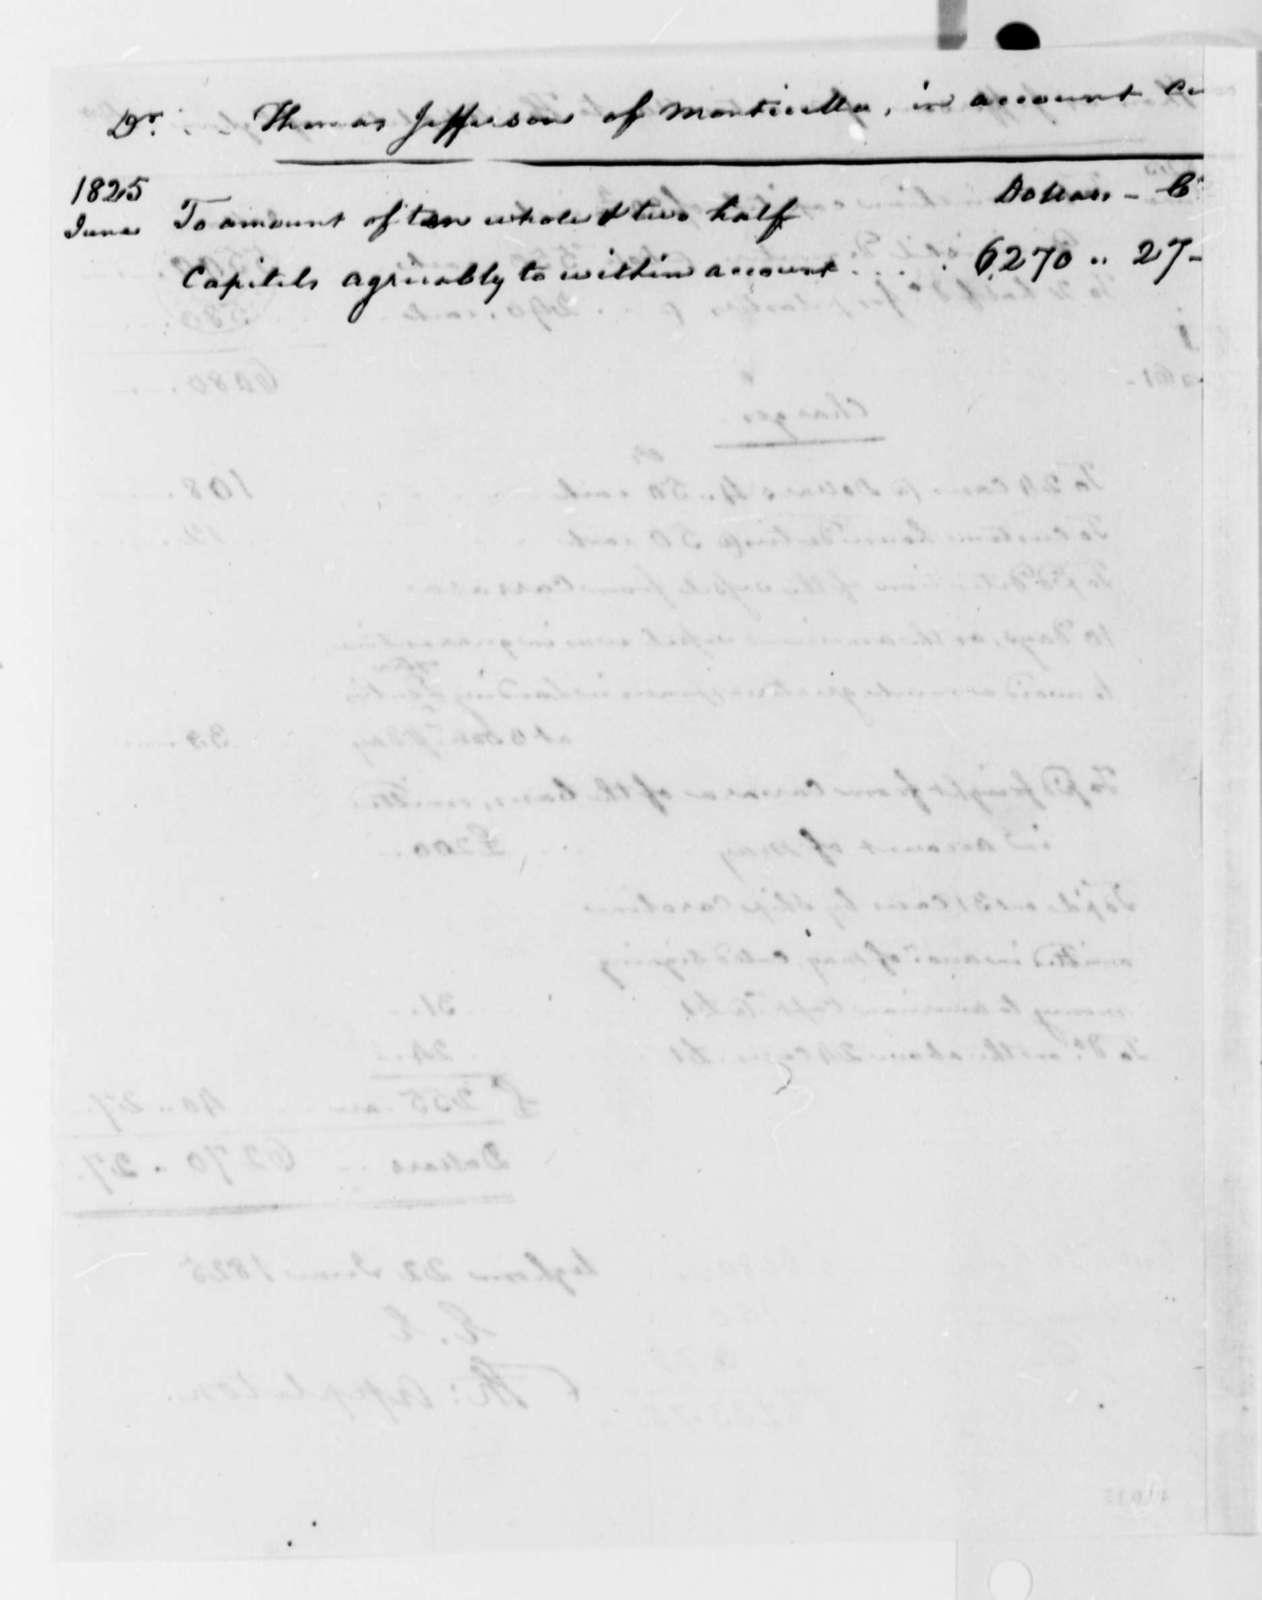 Thomas Appleton to Thomas Jefferson, June 22, 1825, with Invoice